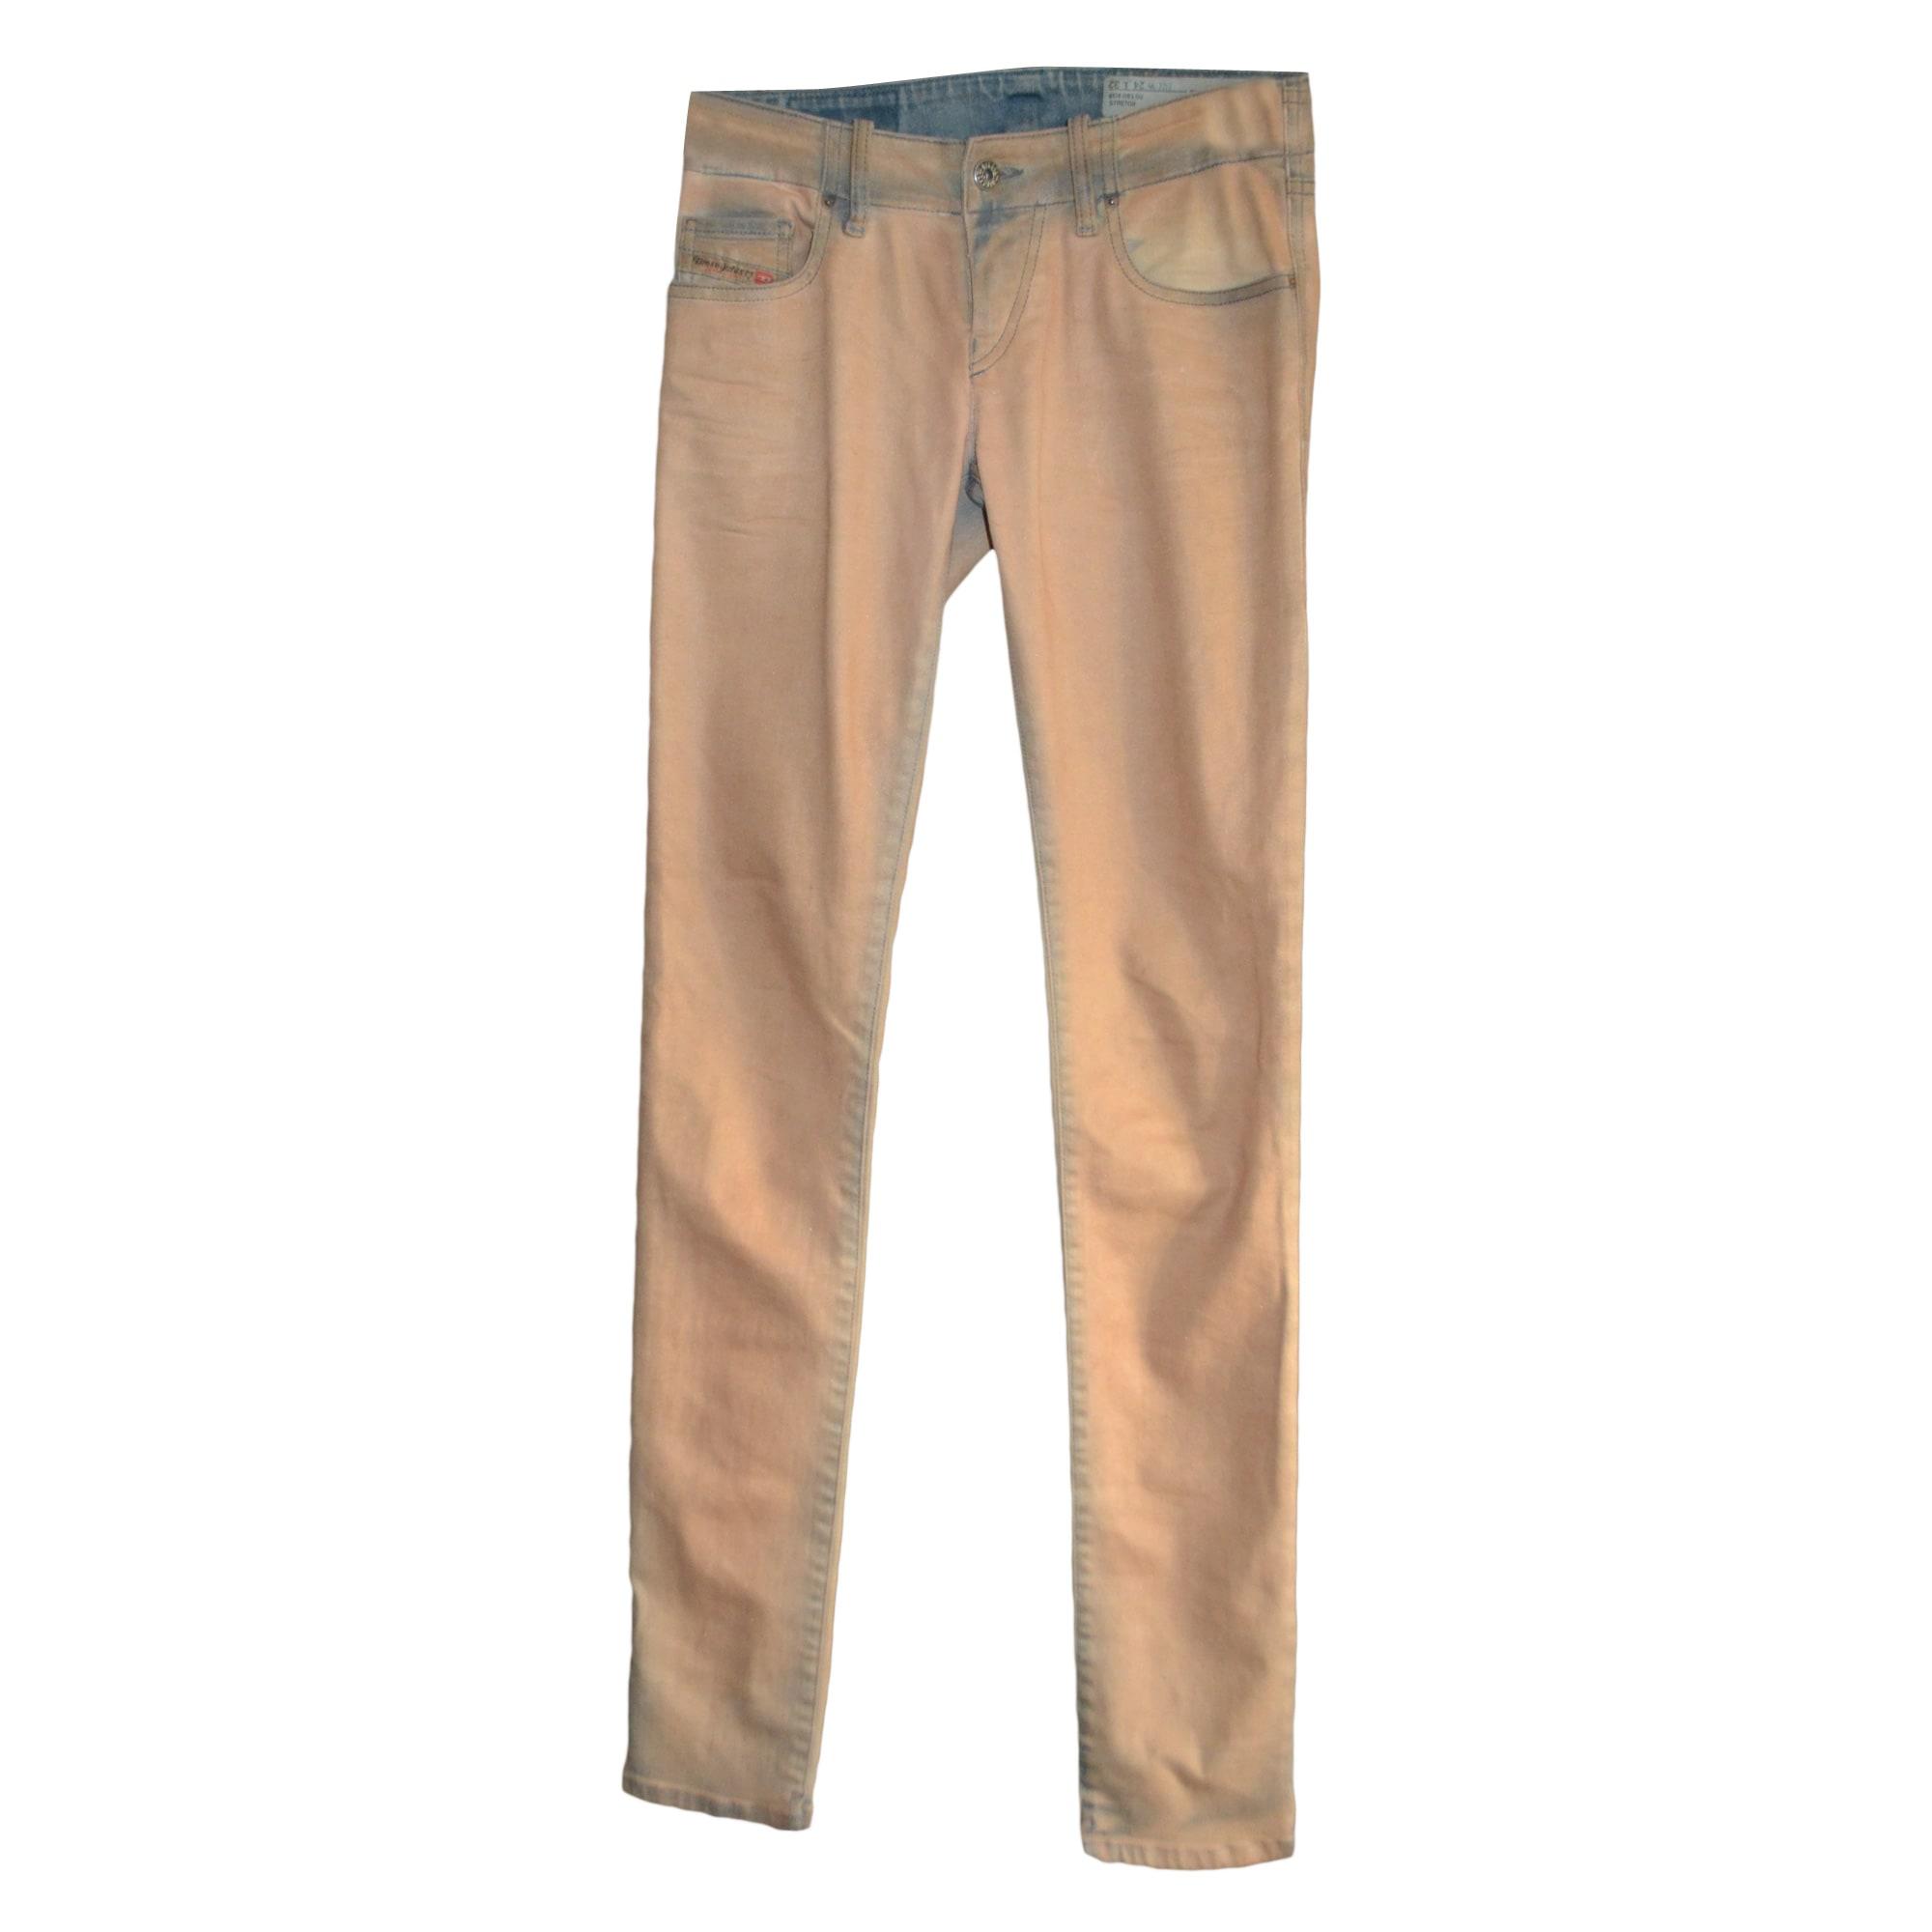 Pantalon slim, cigarette DIESEL Beige, camel